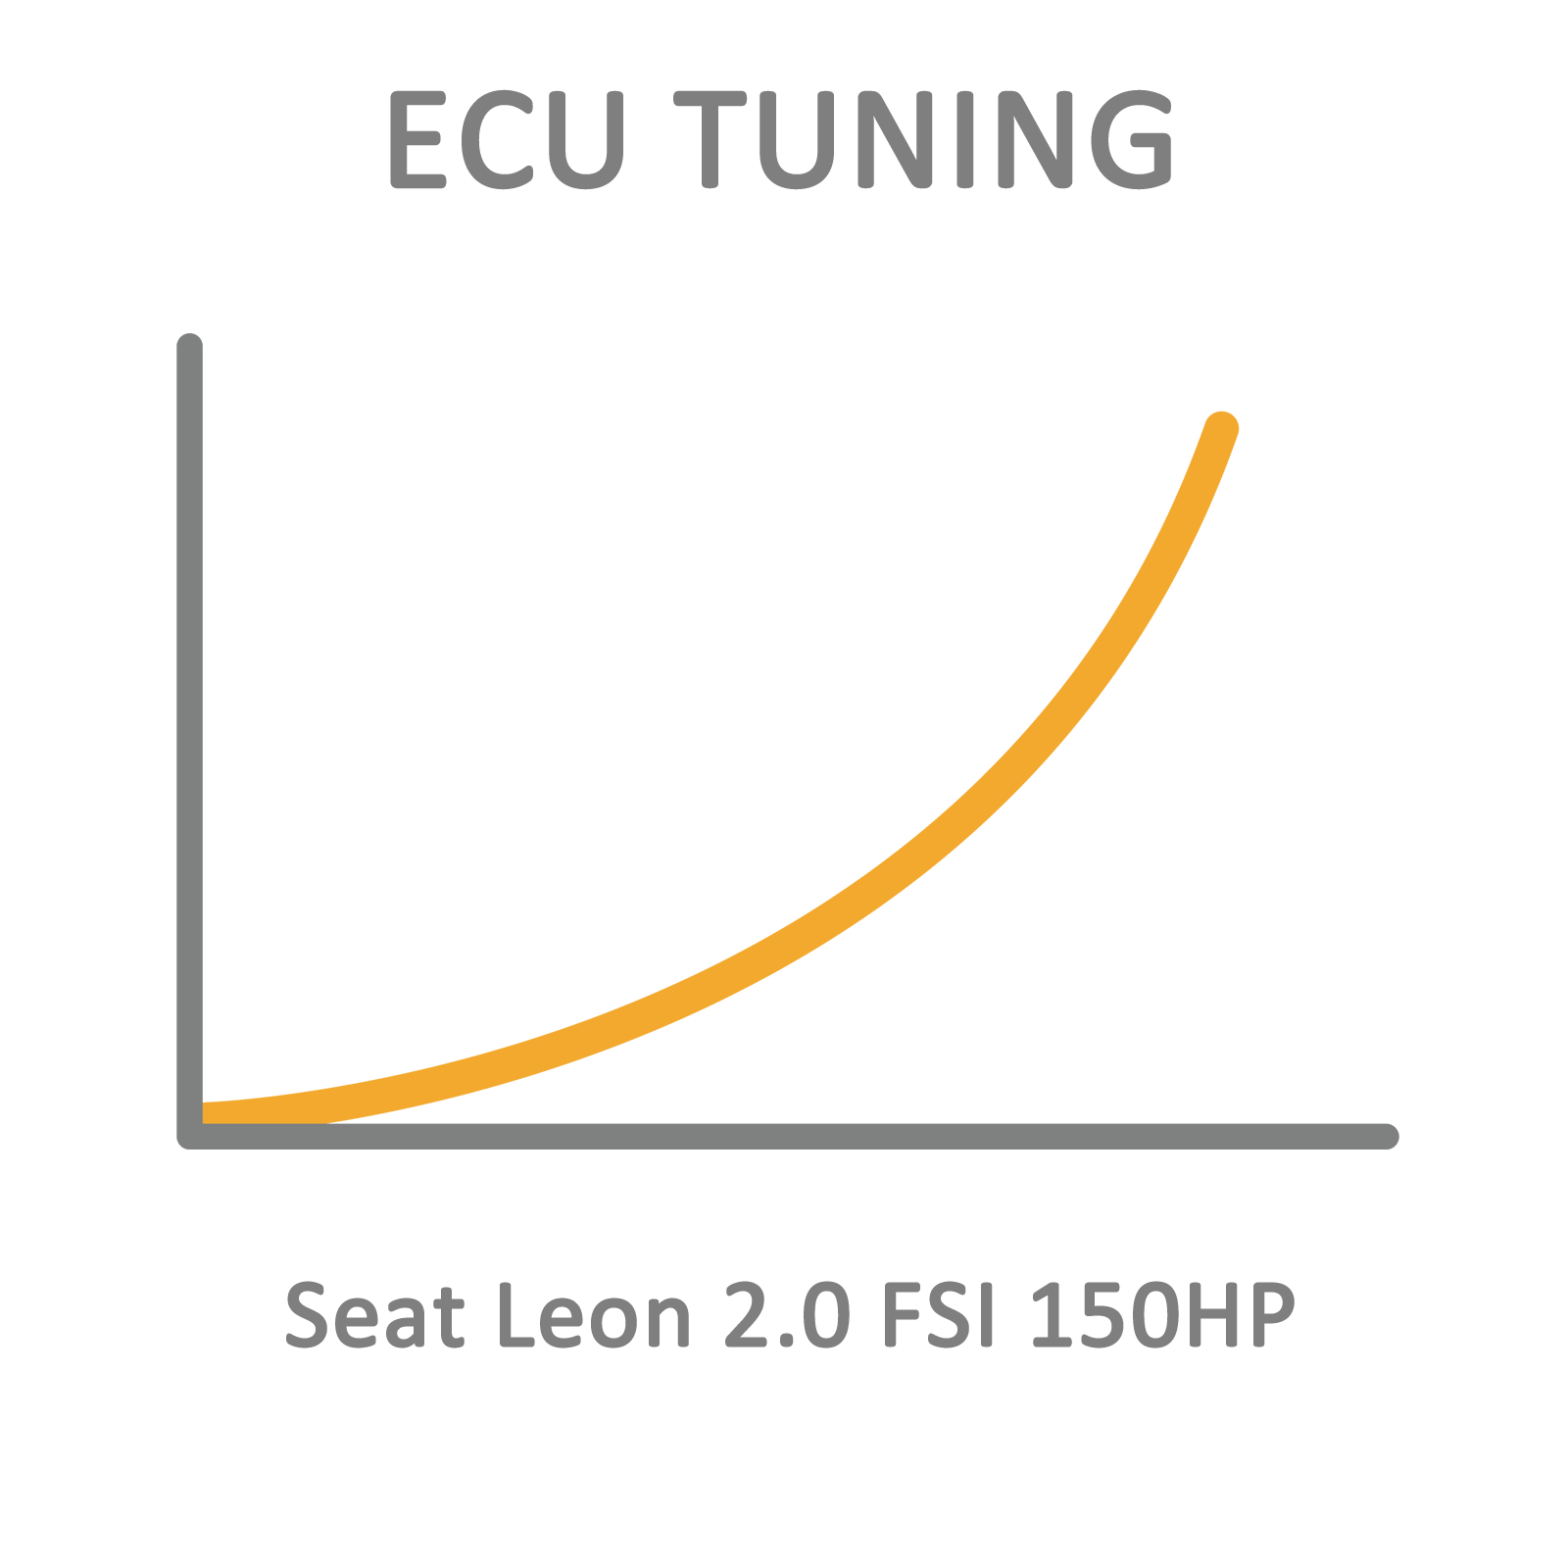 Seat Leon 2.0 FSI 150HP ECU Tuning Remapping Programming